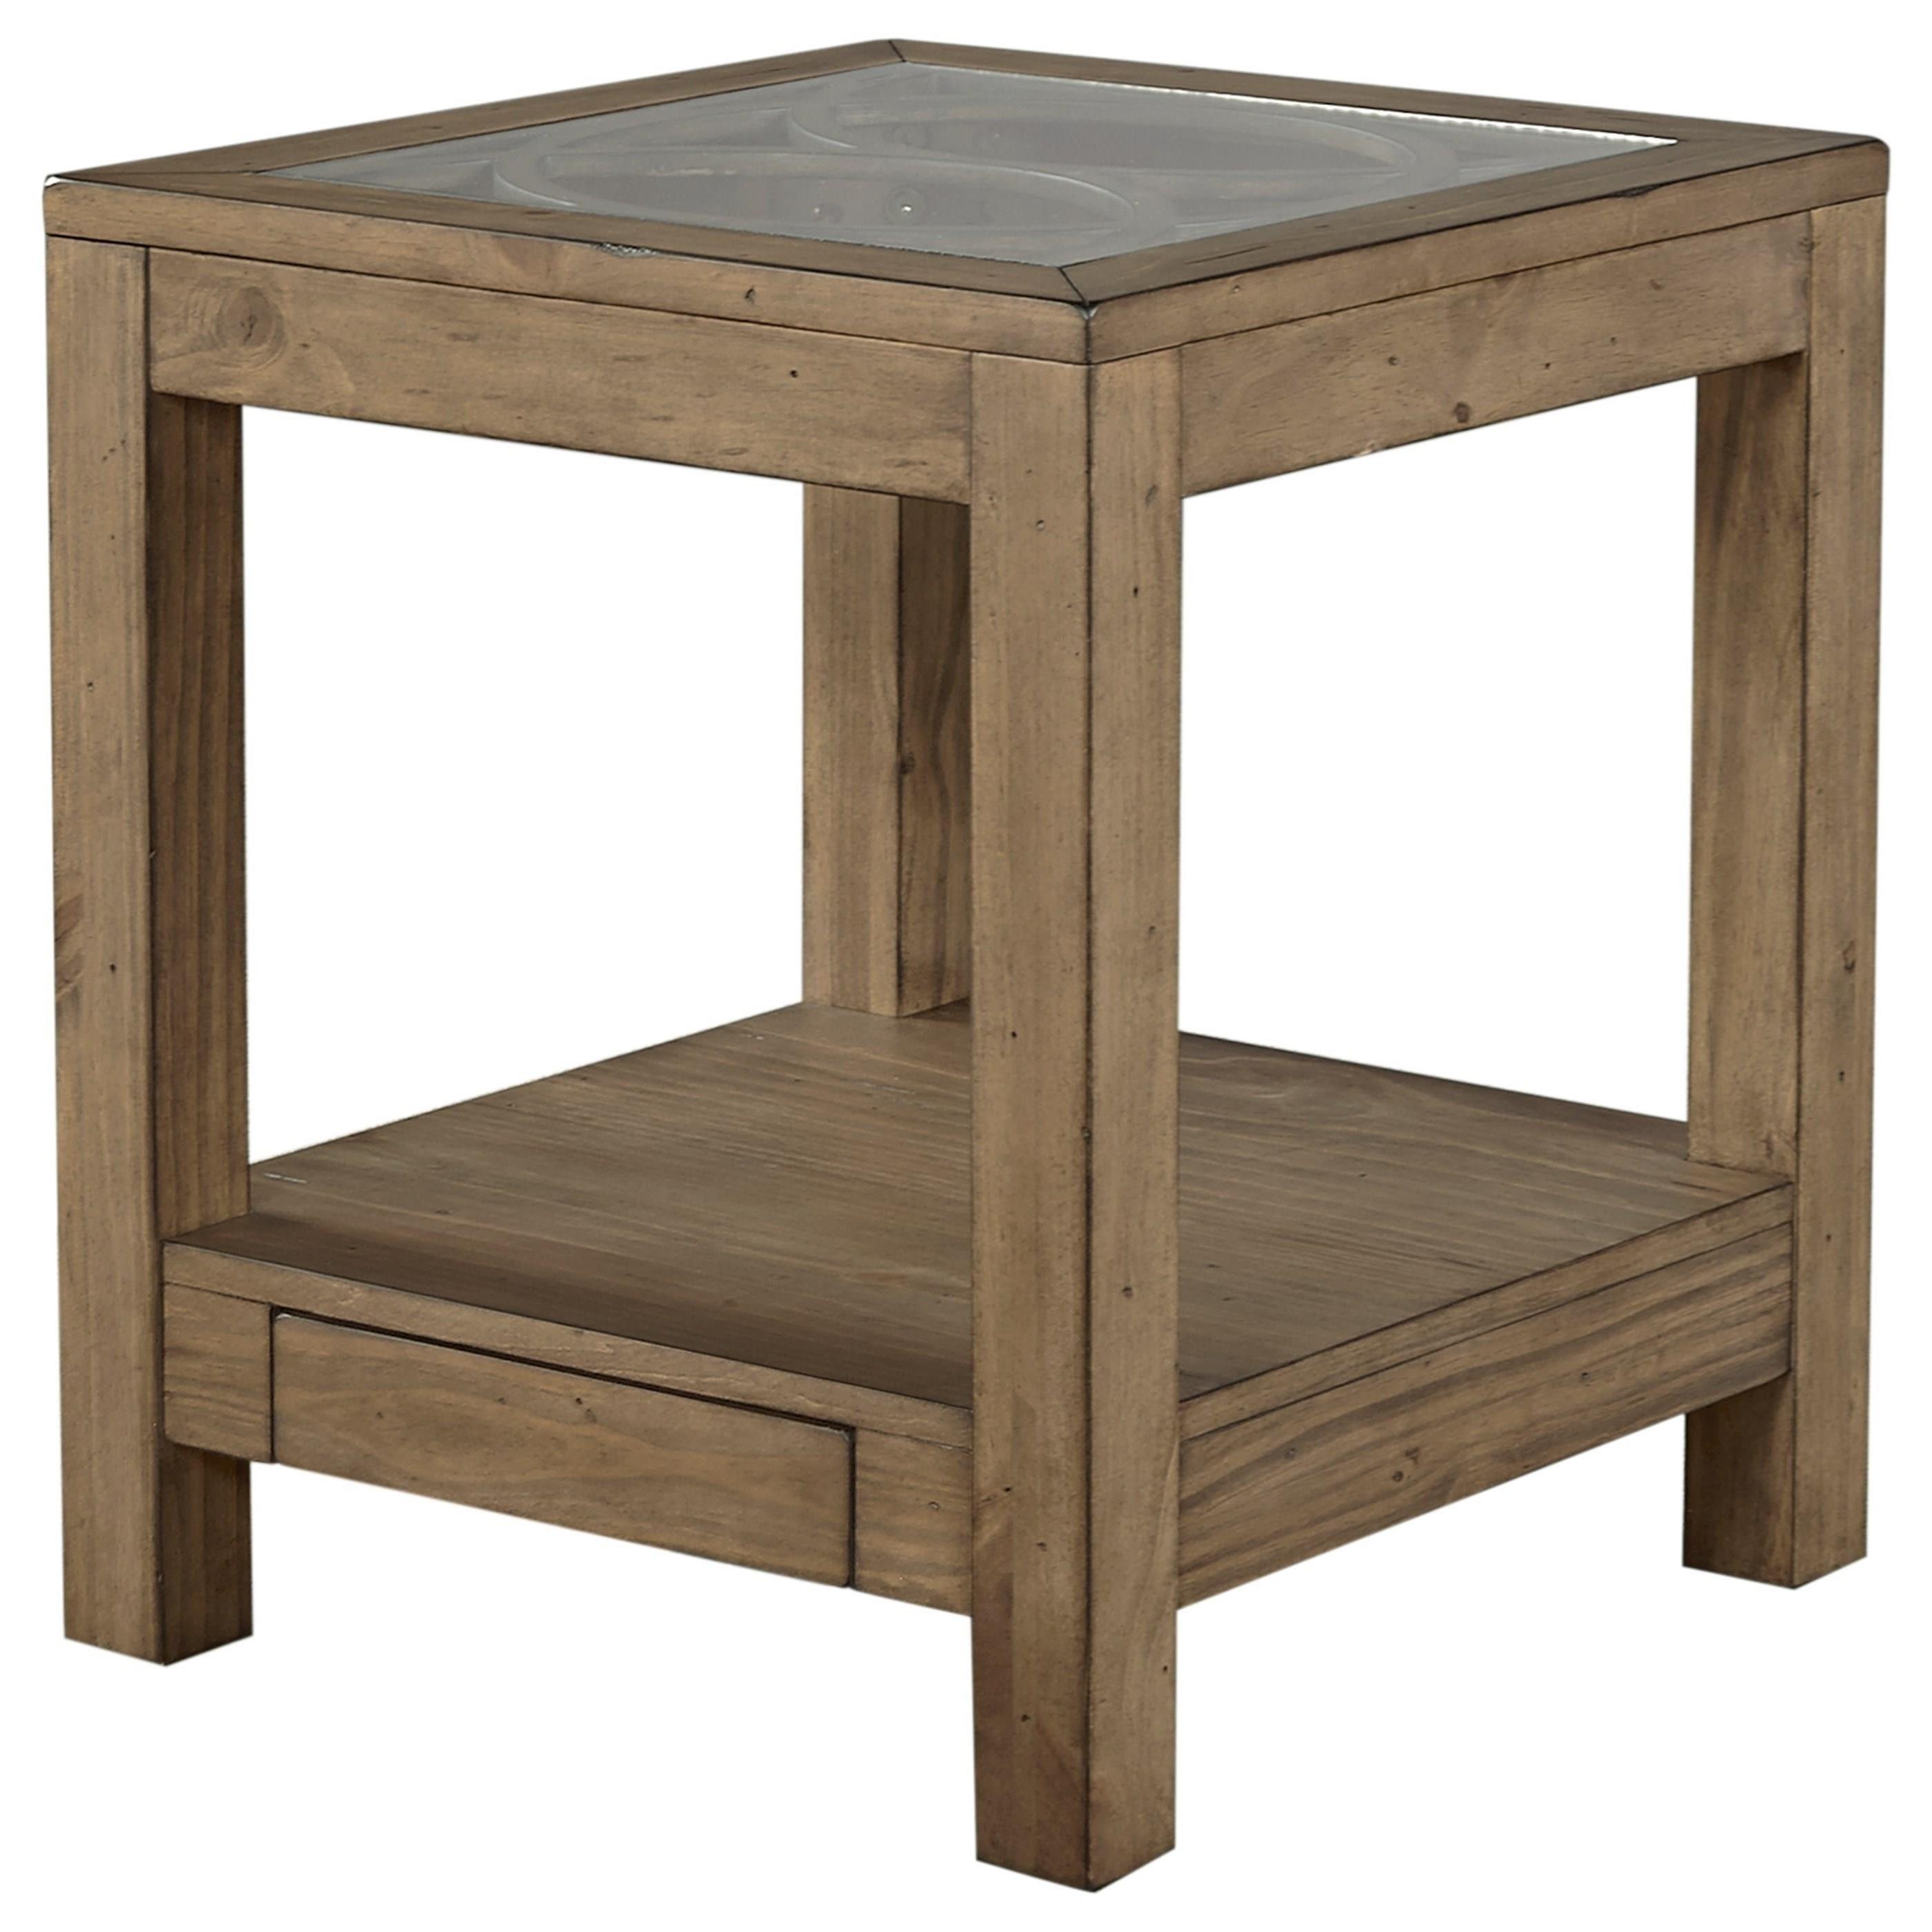 Aspenhome Tildon End Table - Item Number: I56-9145GL